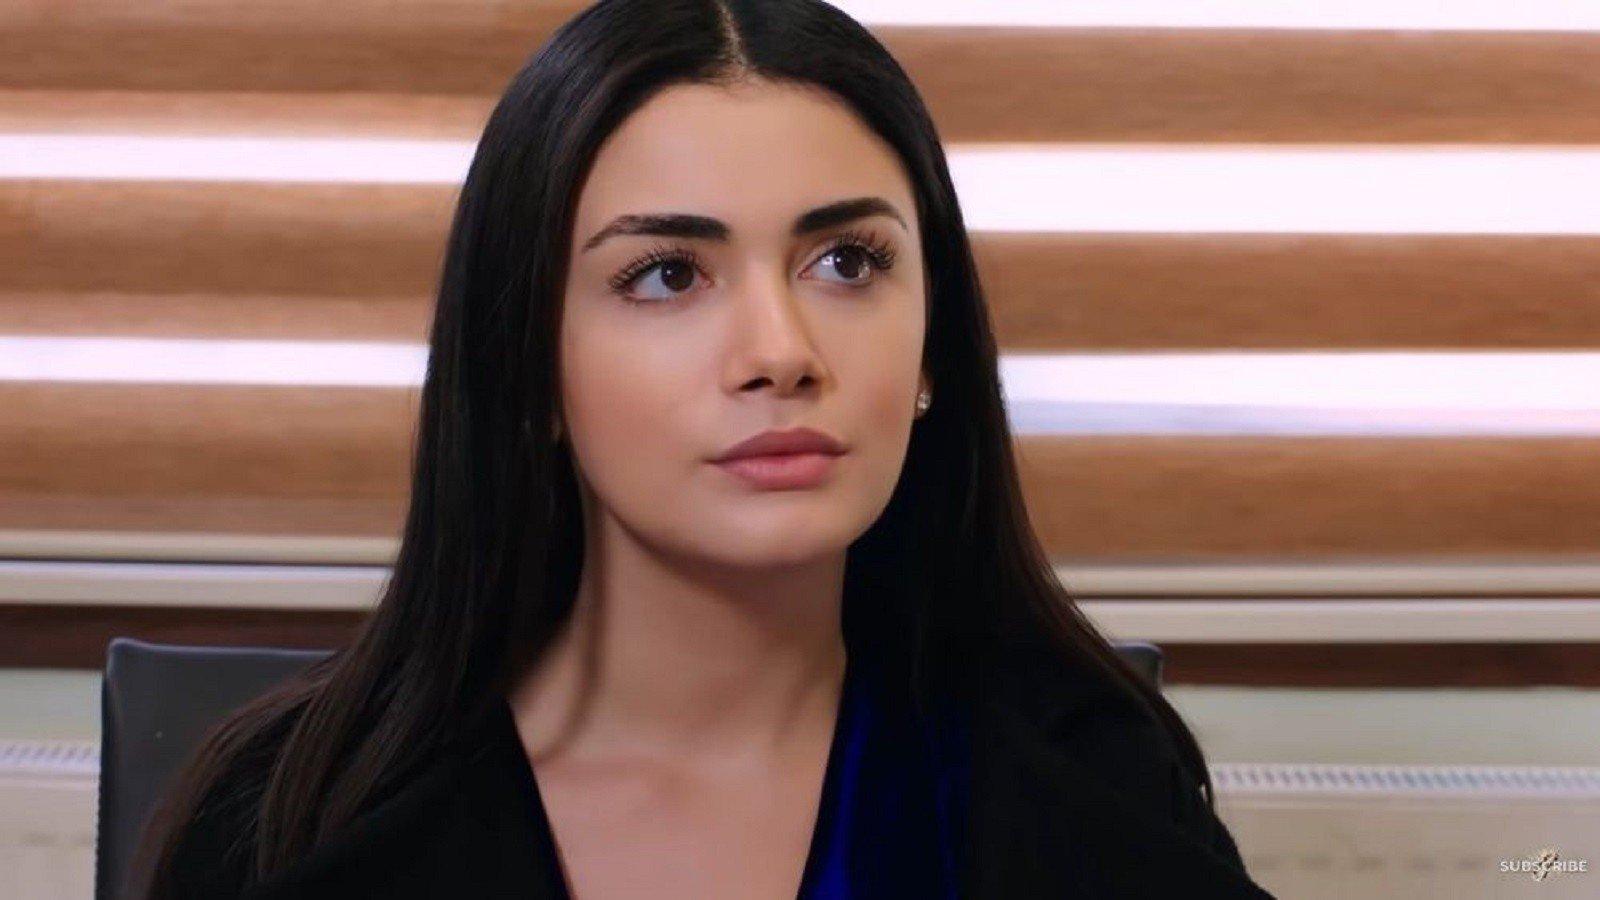 Ozge Yagiz as Reyhan in Yemin (The Oath)